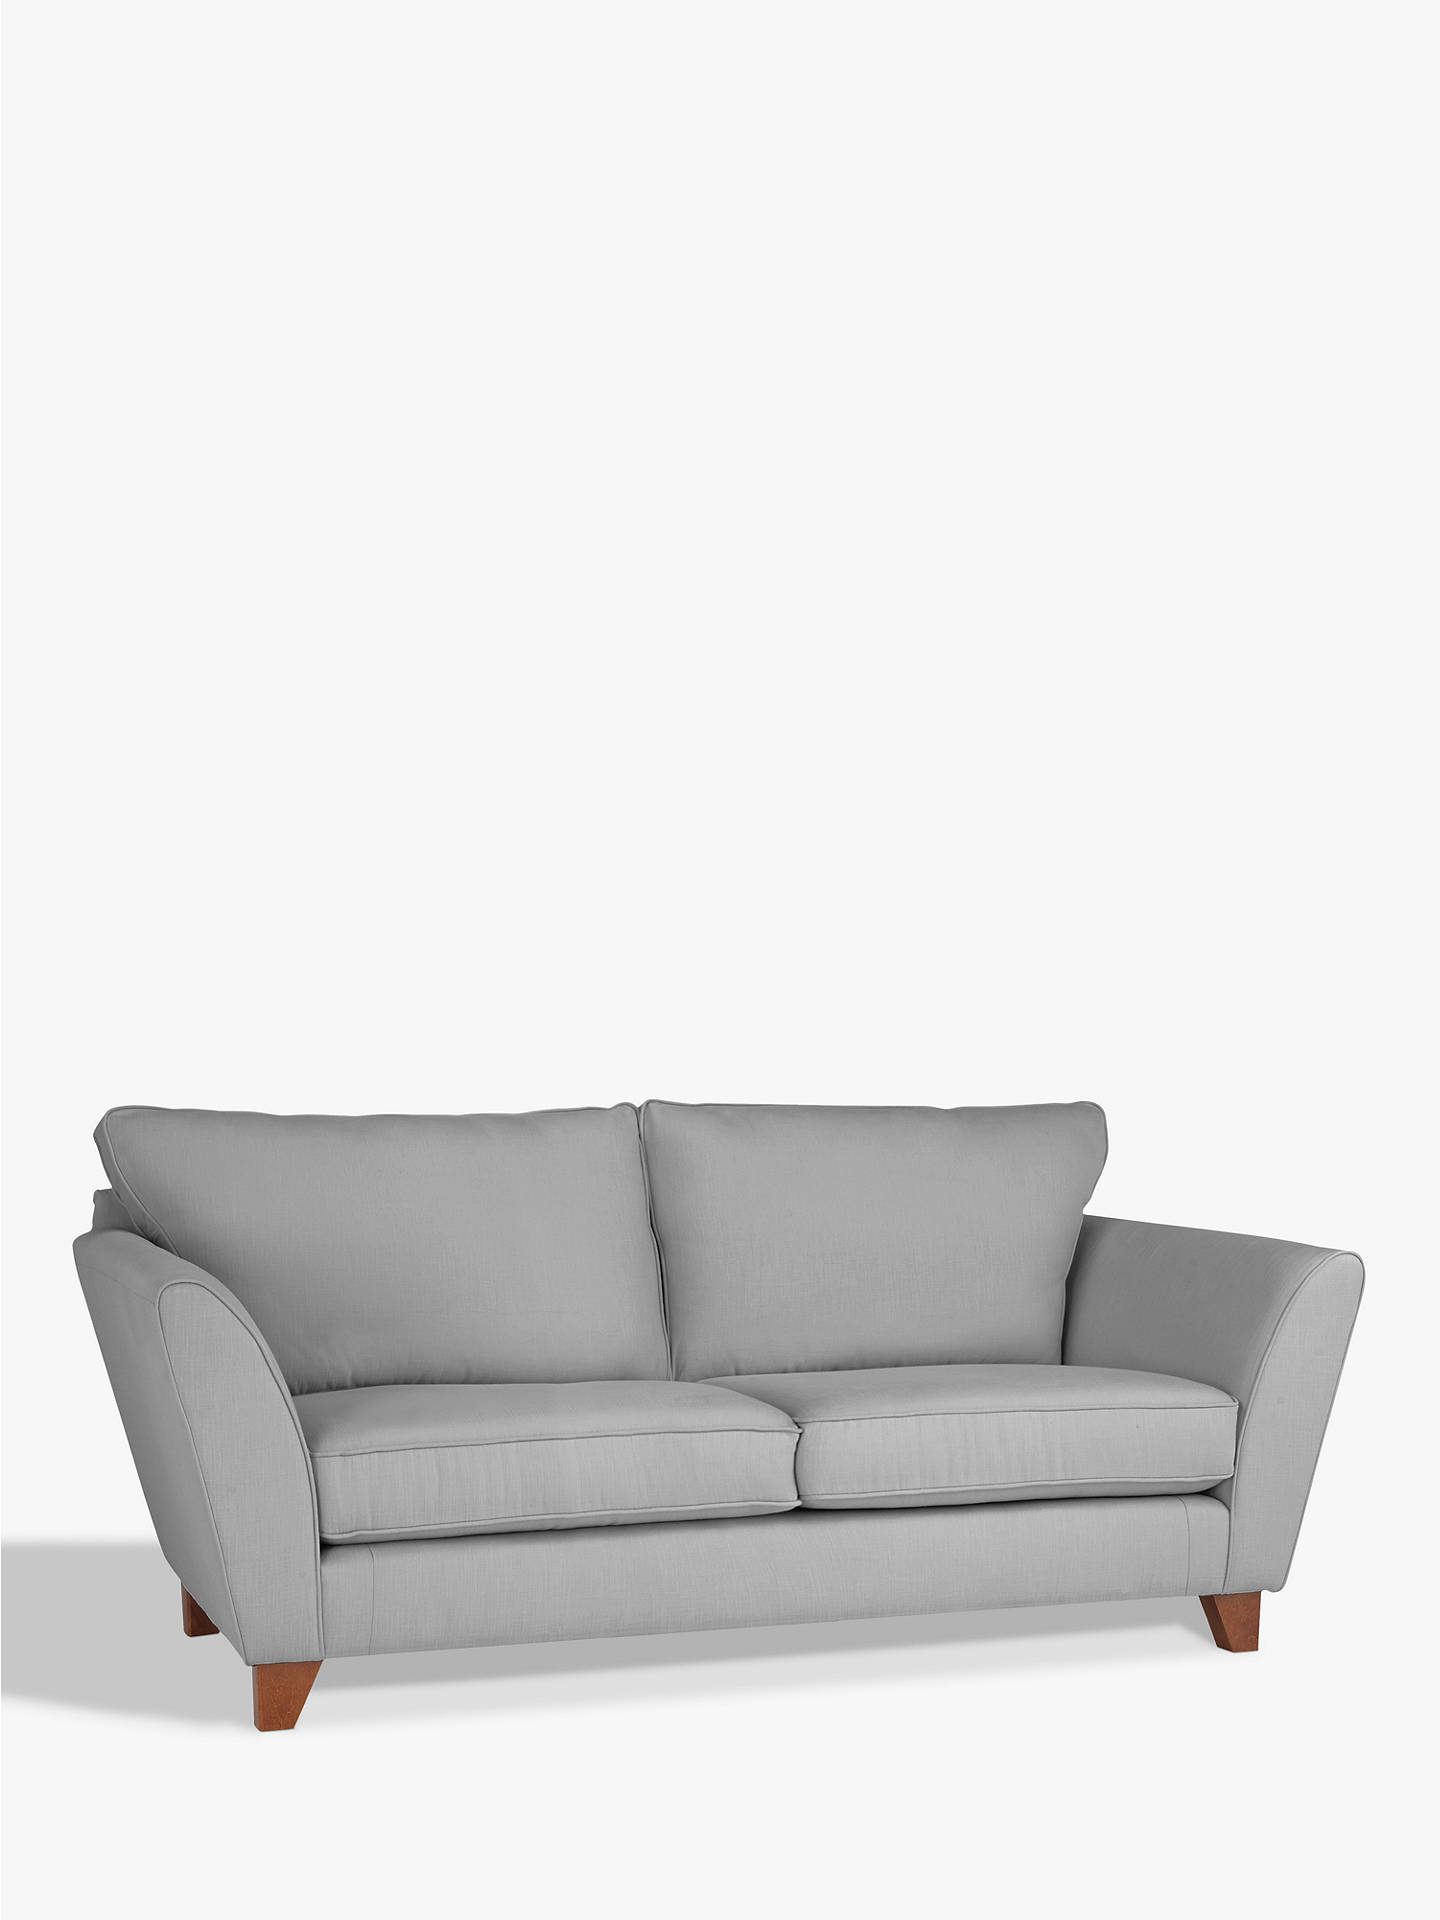 Svært John Lewis & Partners Oslo Large 3 Seater Sofa at John Lewis VV-44